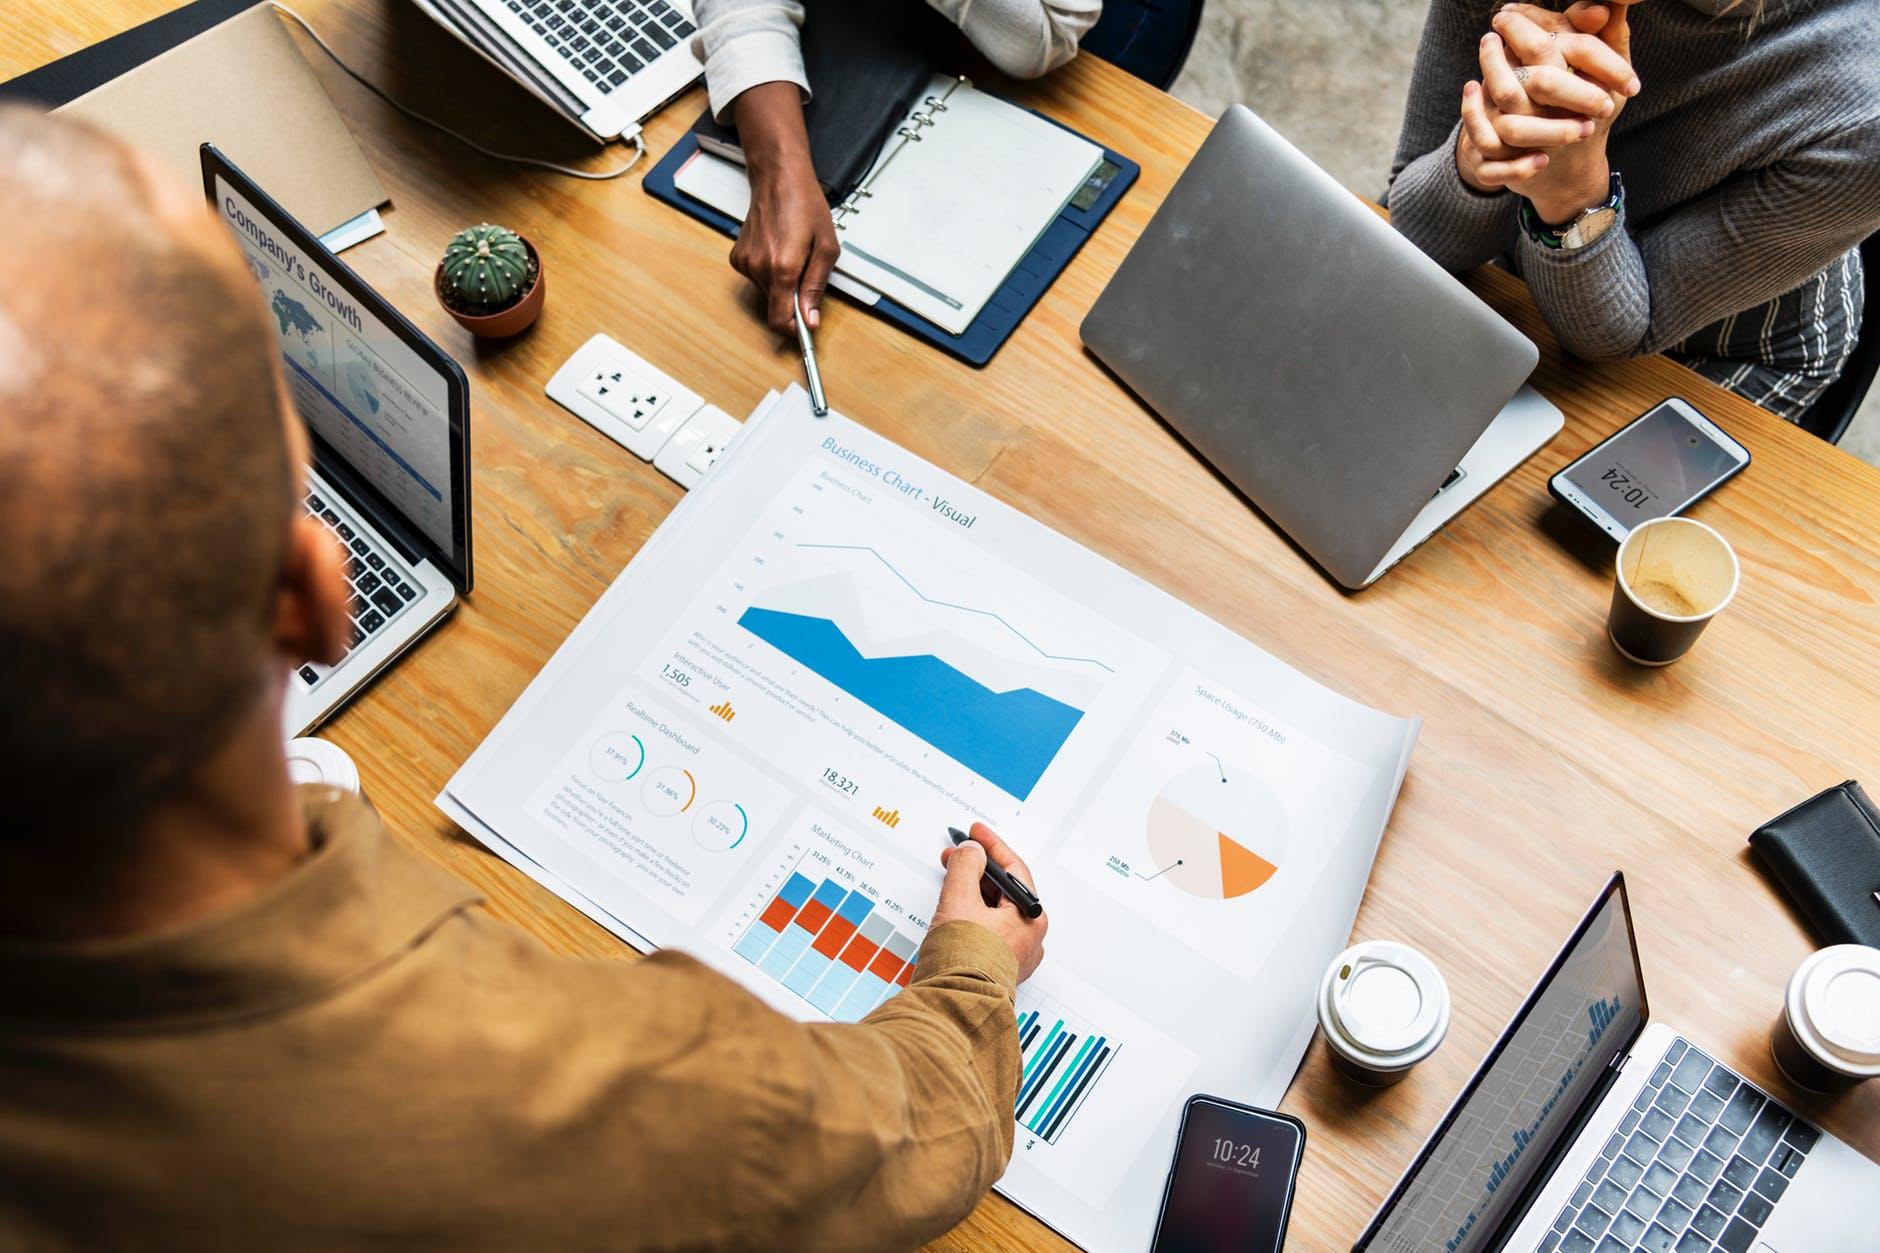 ppc management services emerge online